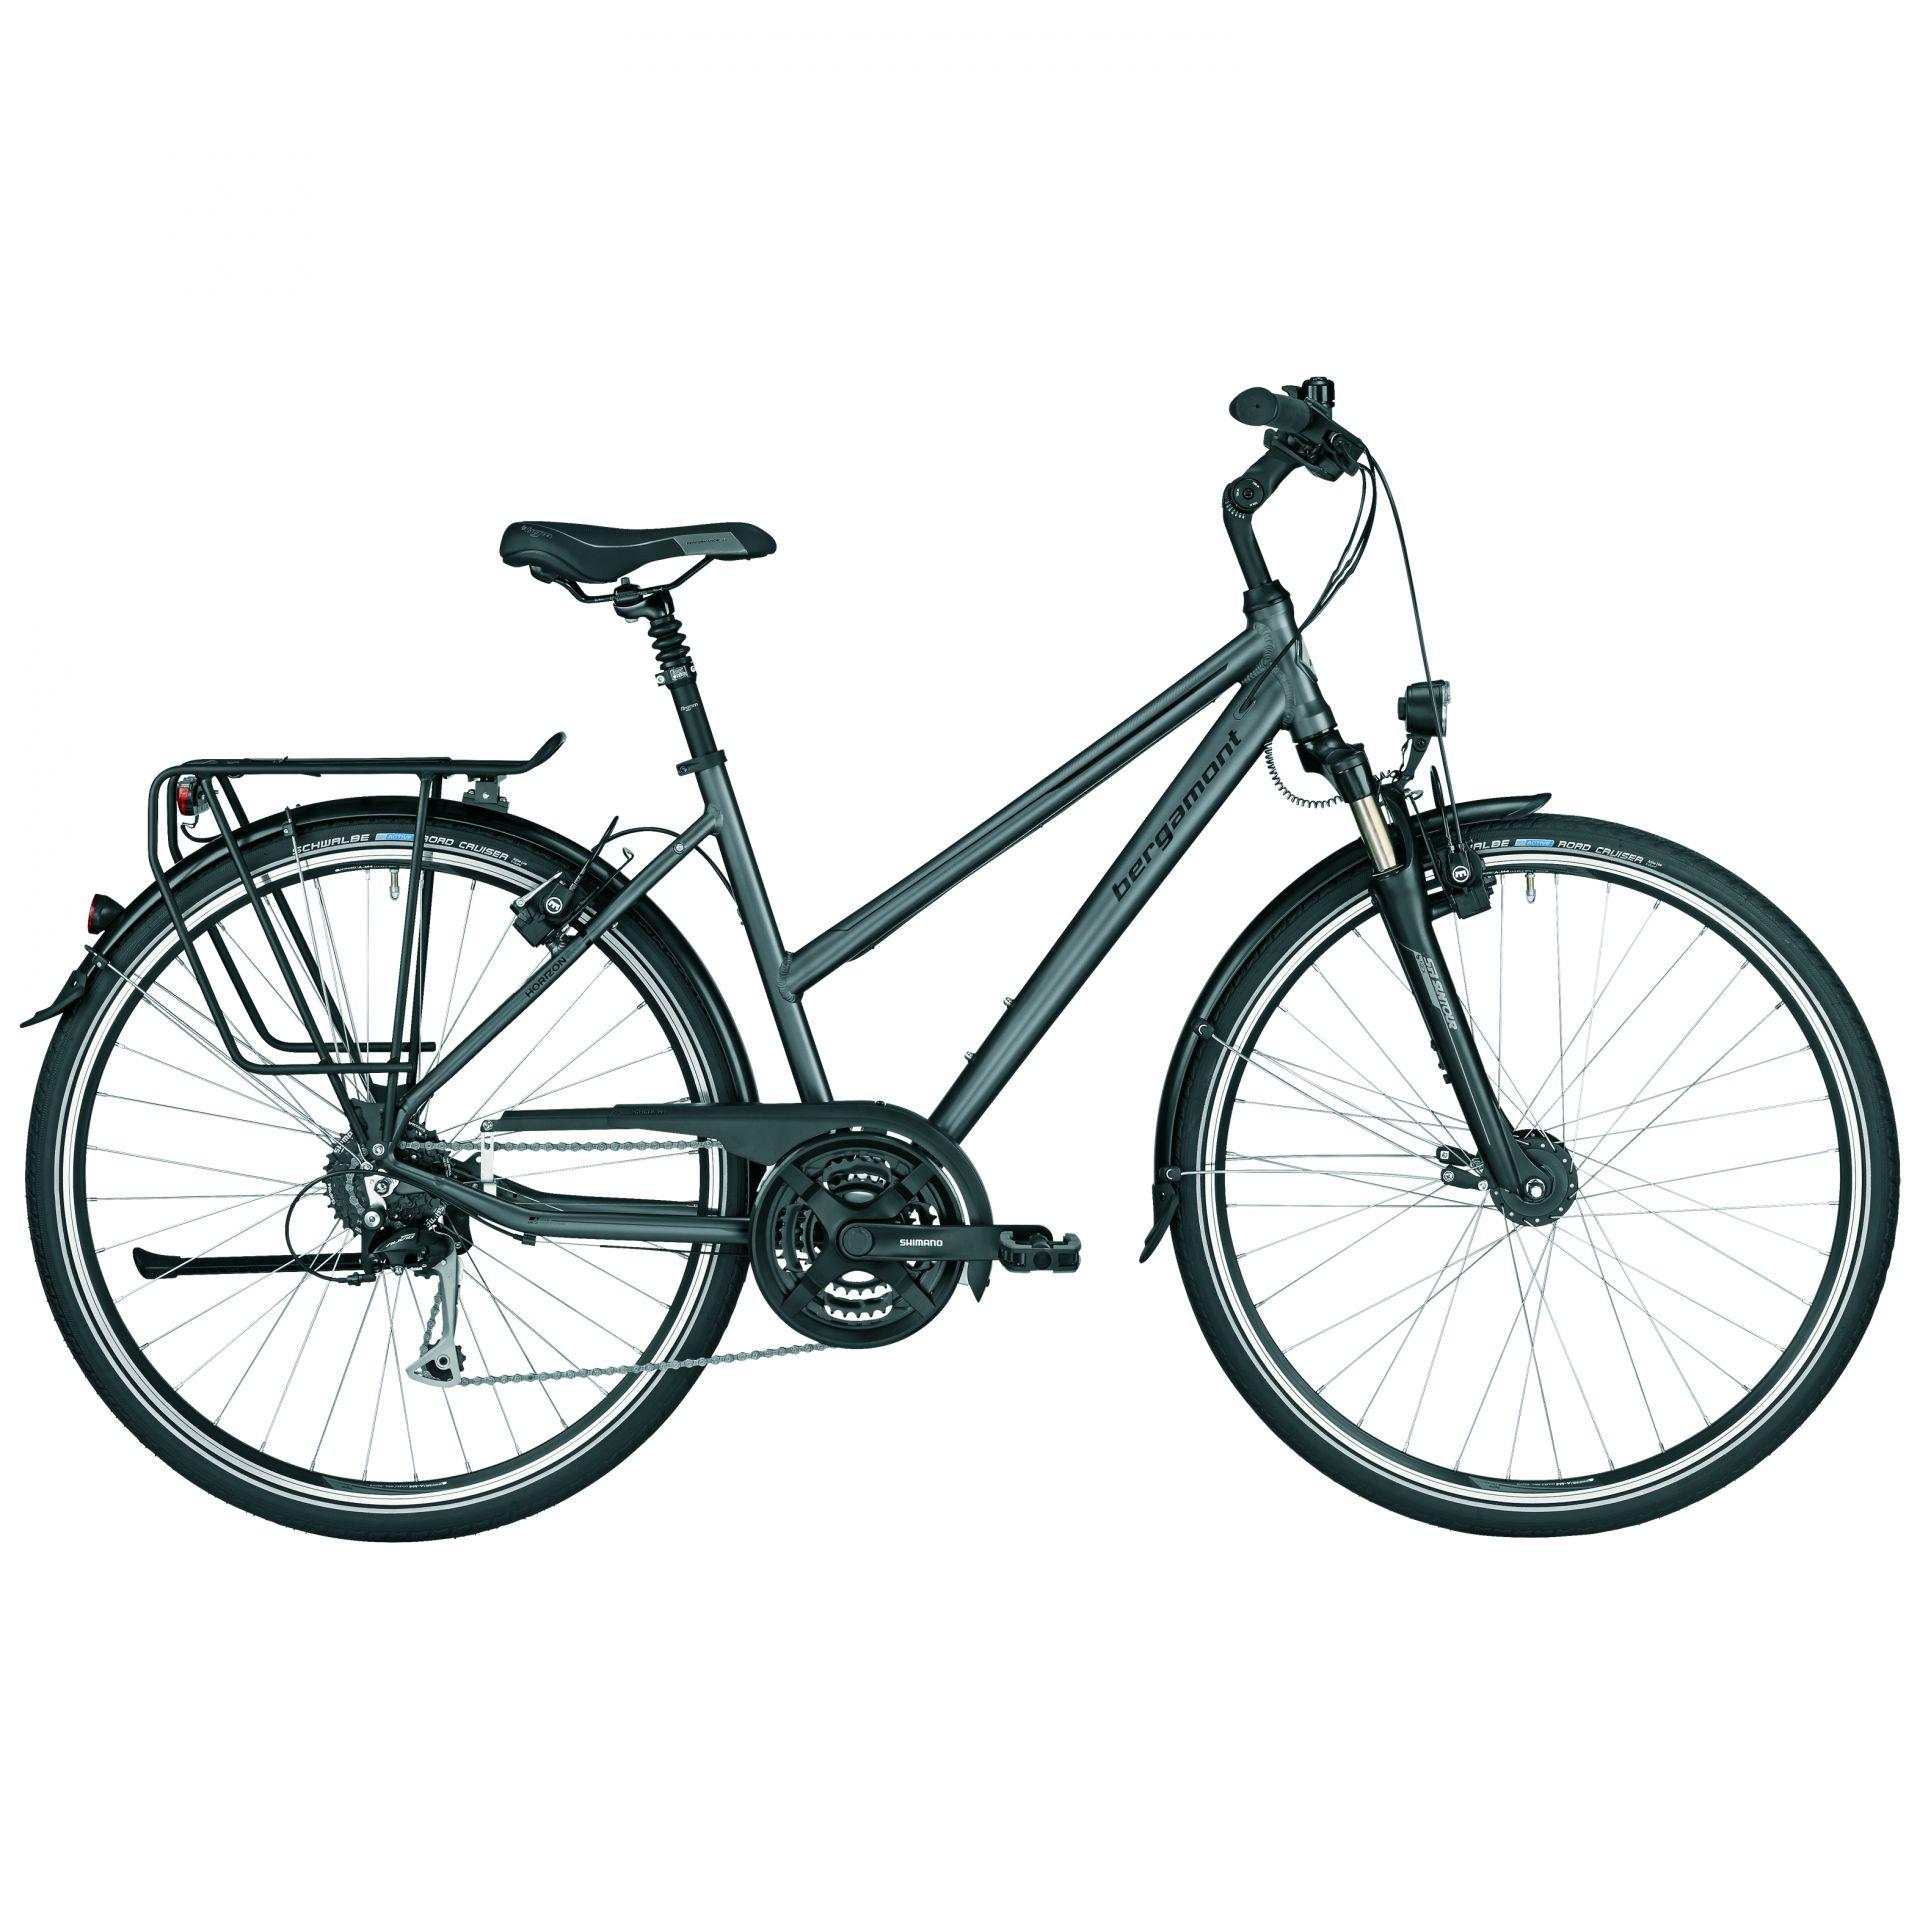 Vélo urbain Bergamont Horizon 5.0 Amsterdam Gris/Noir - 44 cm